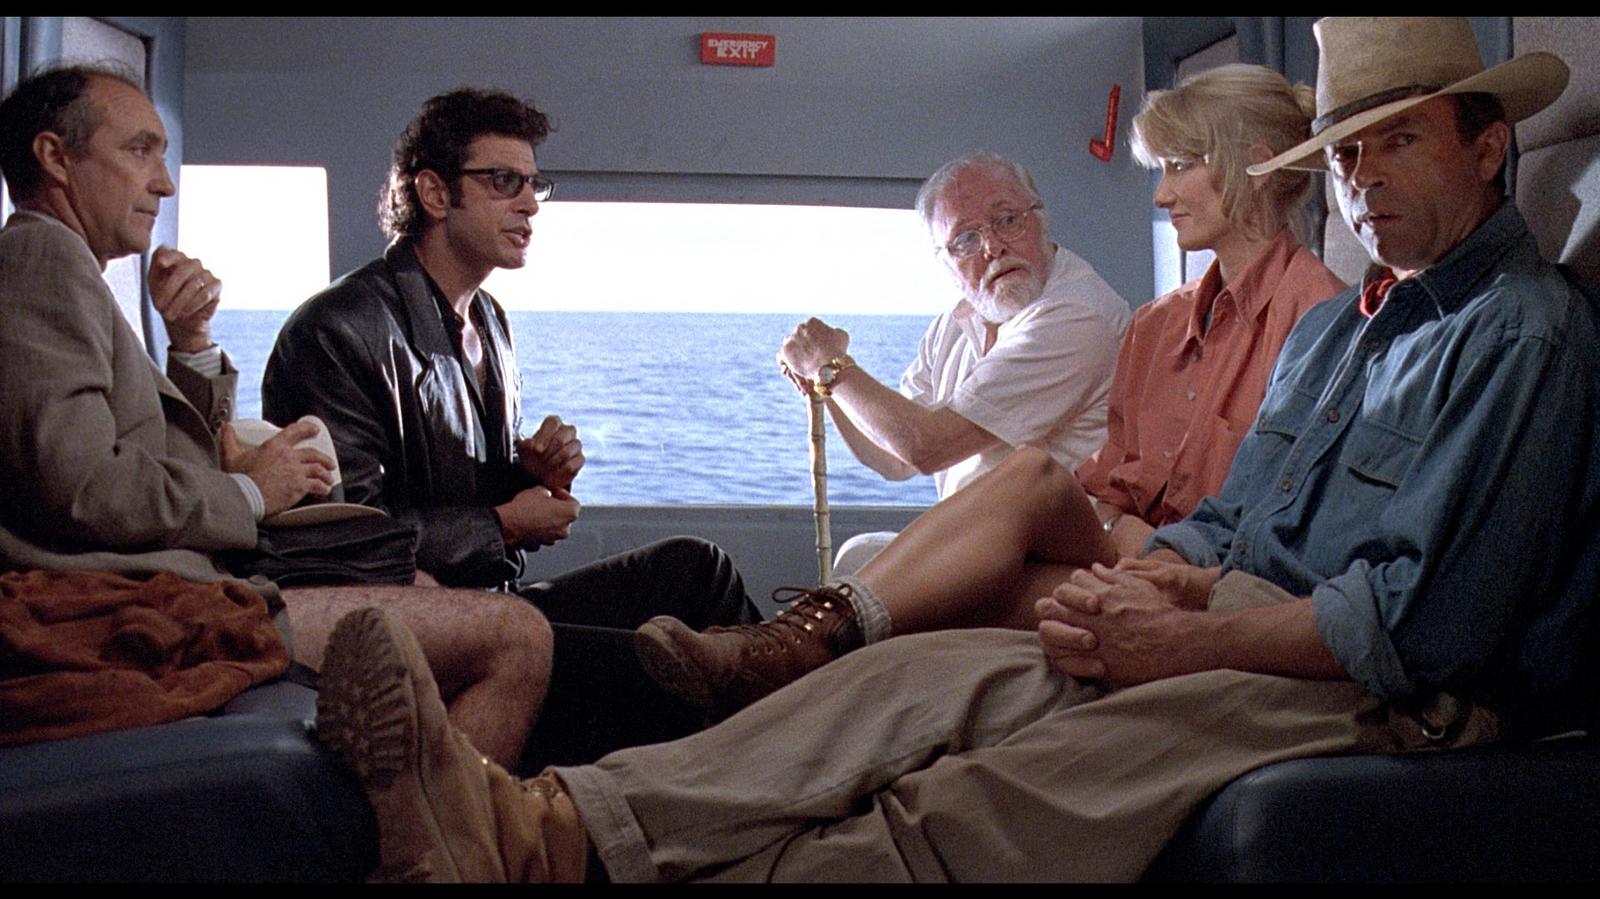 Jeff Goldblum, Laura Dern, and Sam Neill Are Returning to Jurassic Park